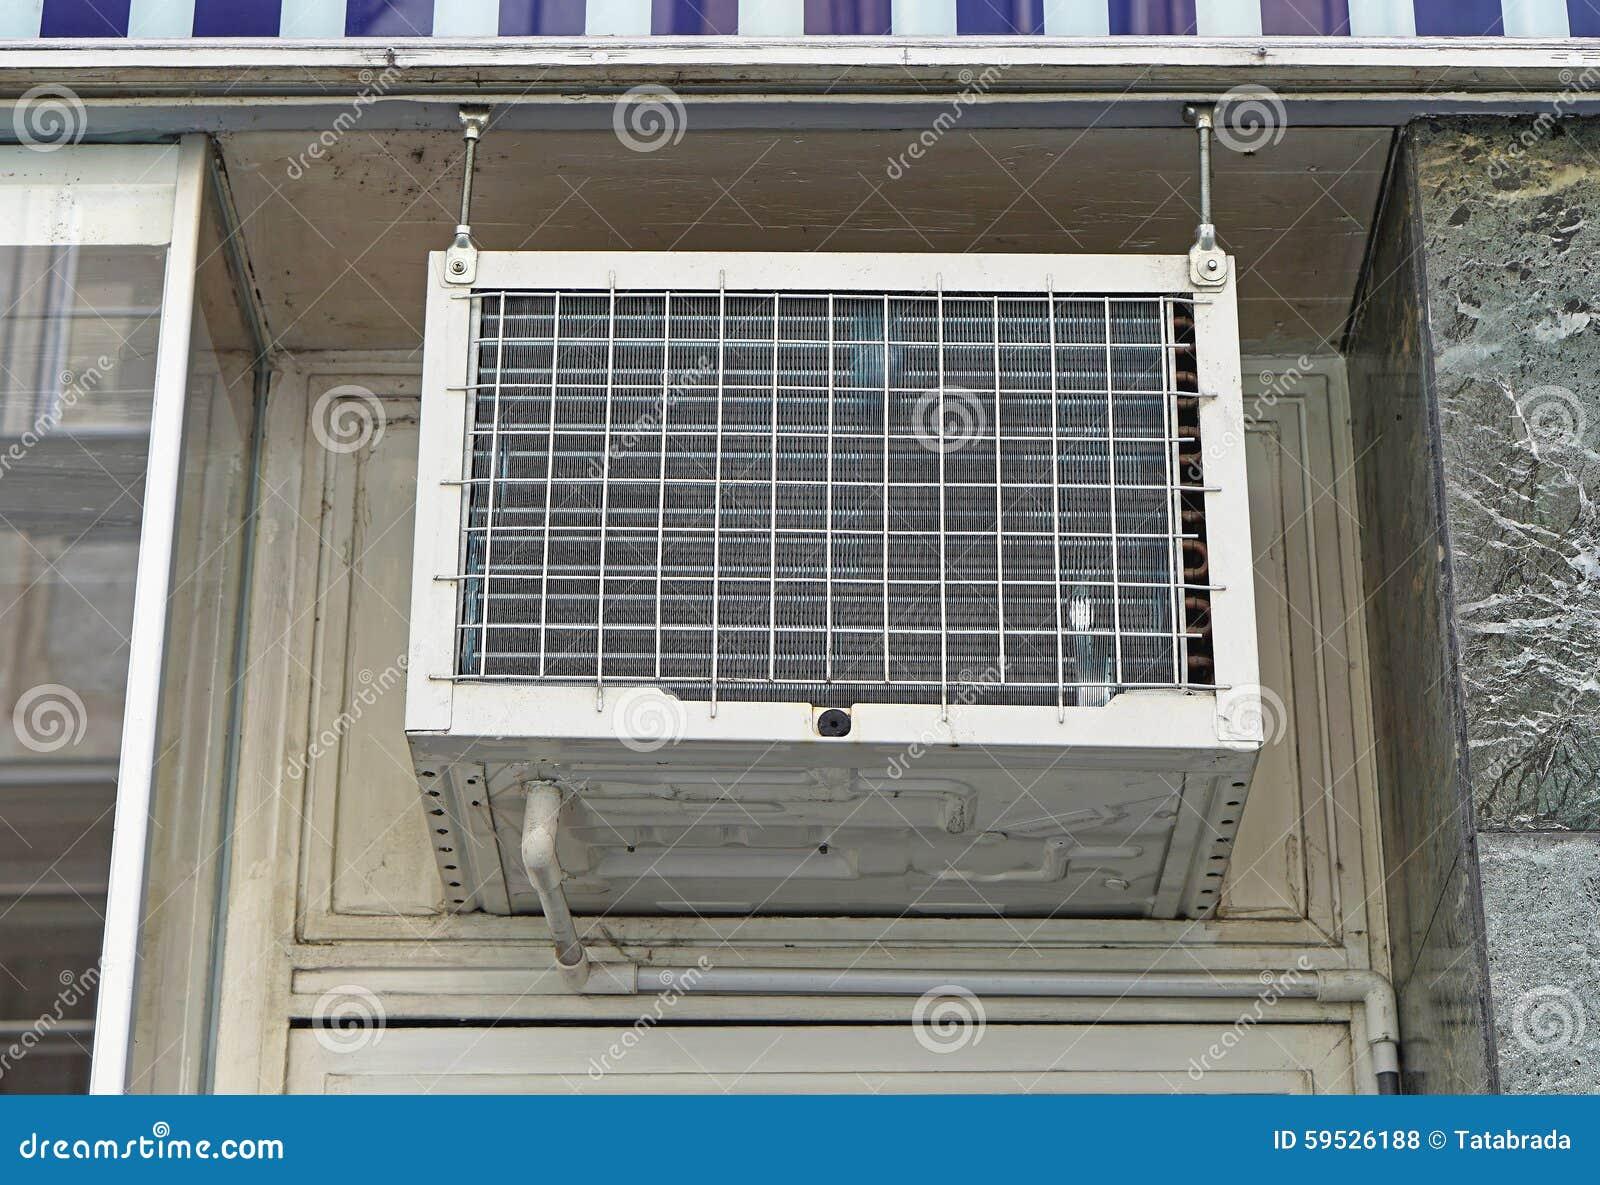 Window Air Conditioner Stock Photo Image: 59526188 #474966